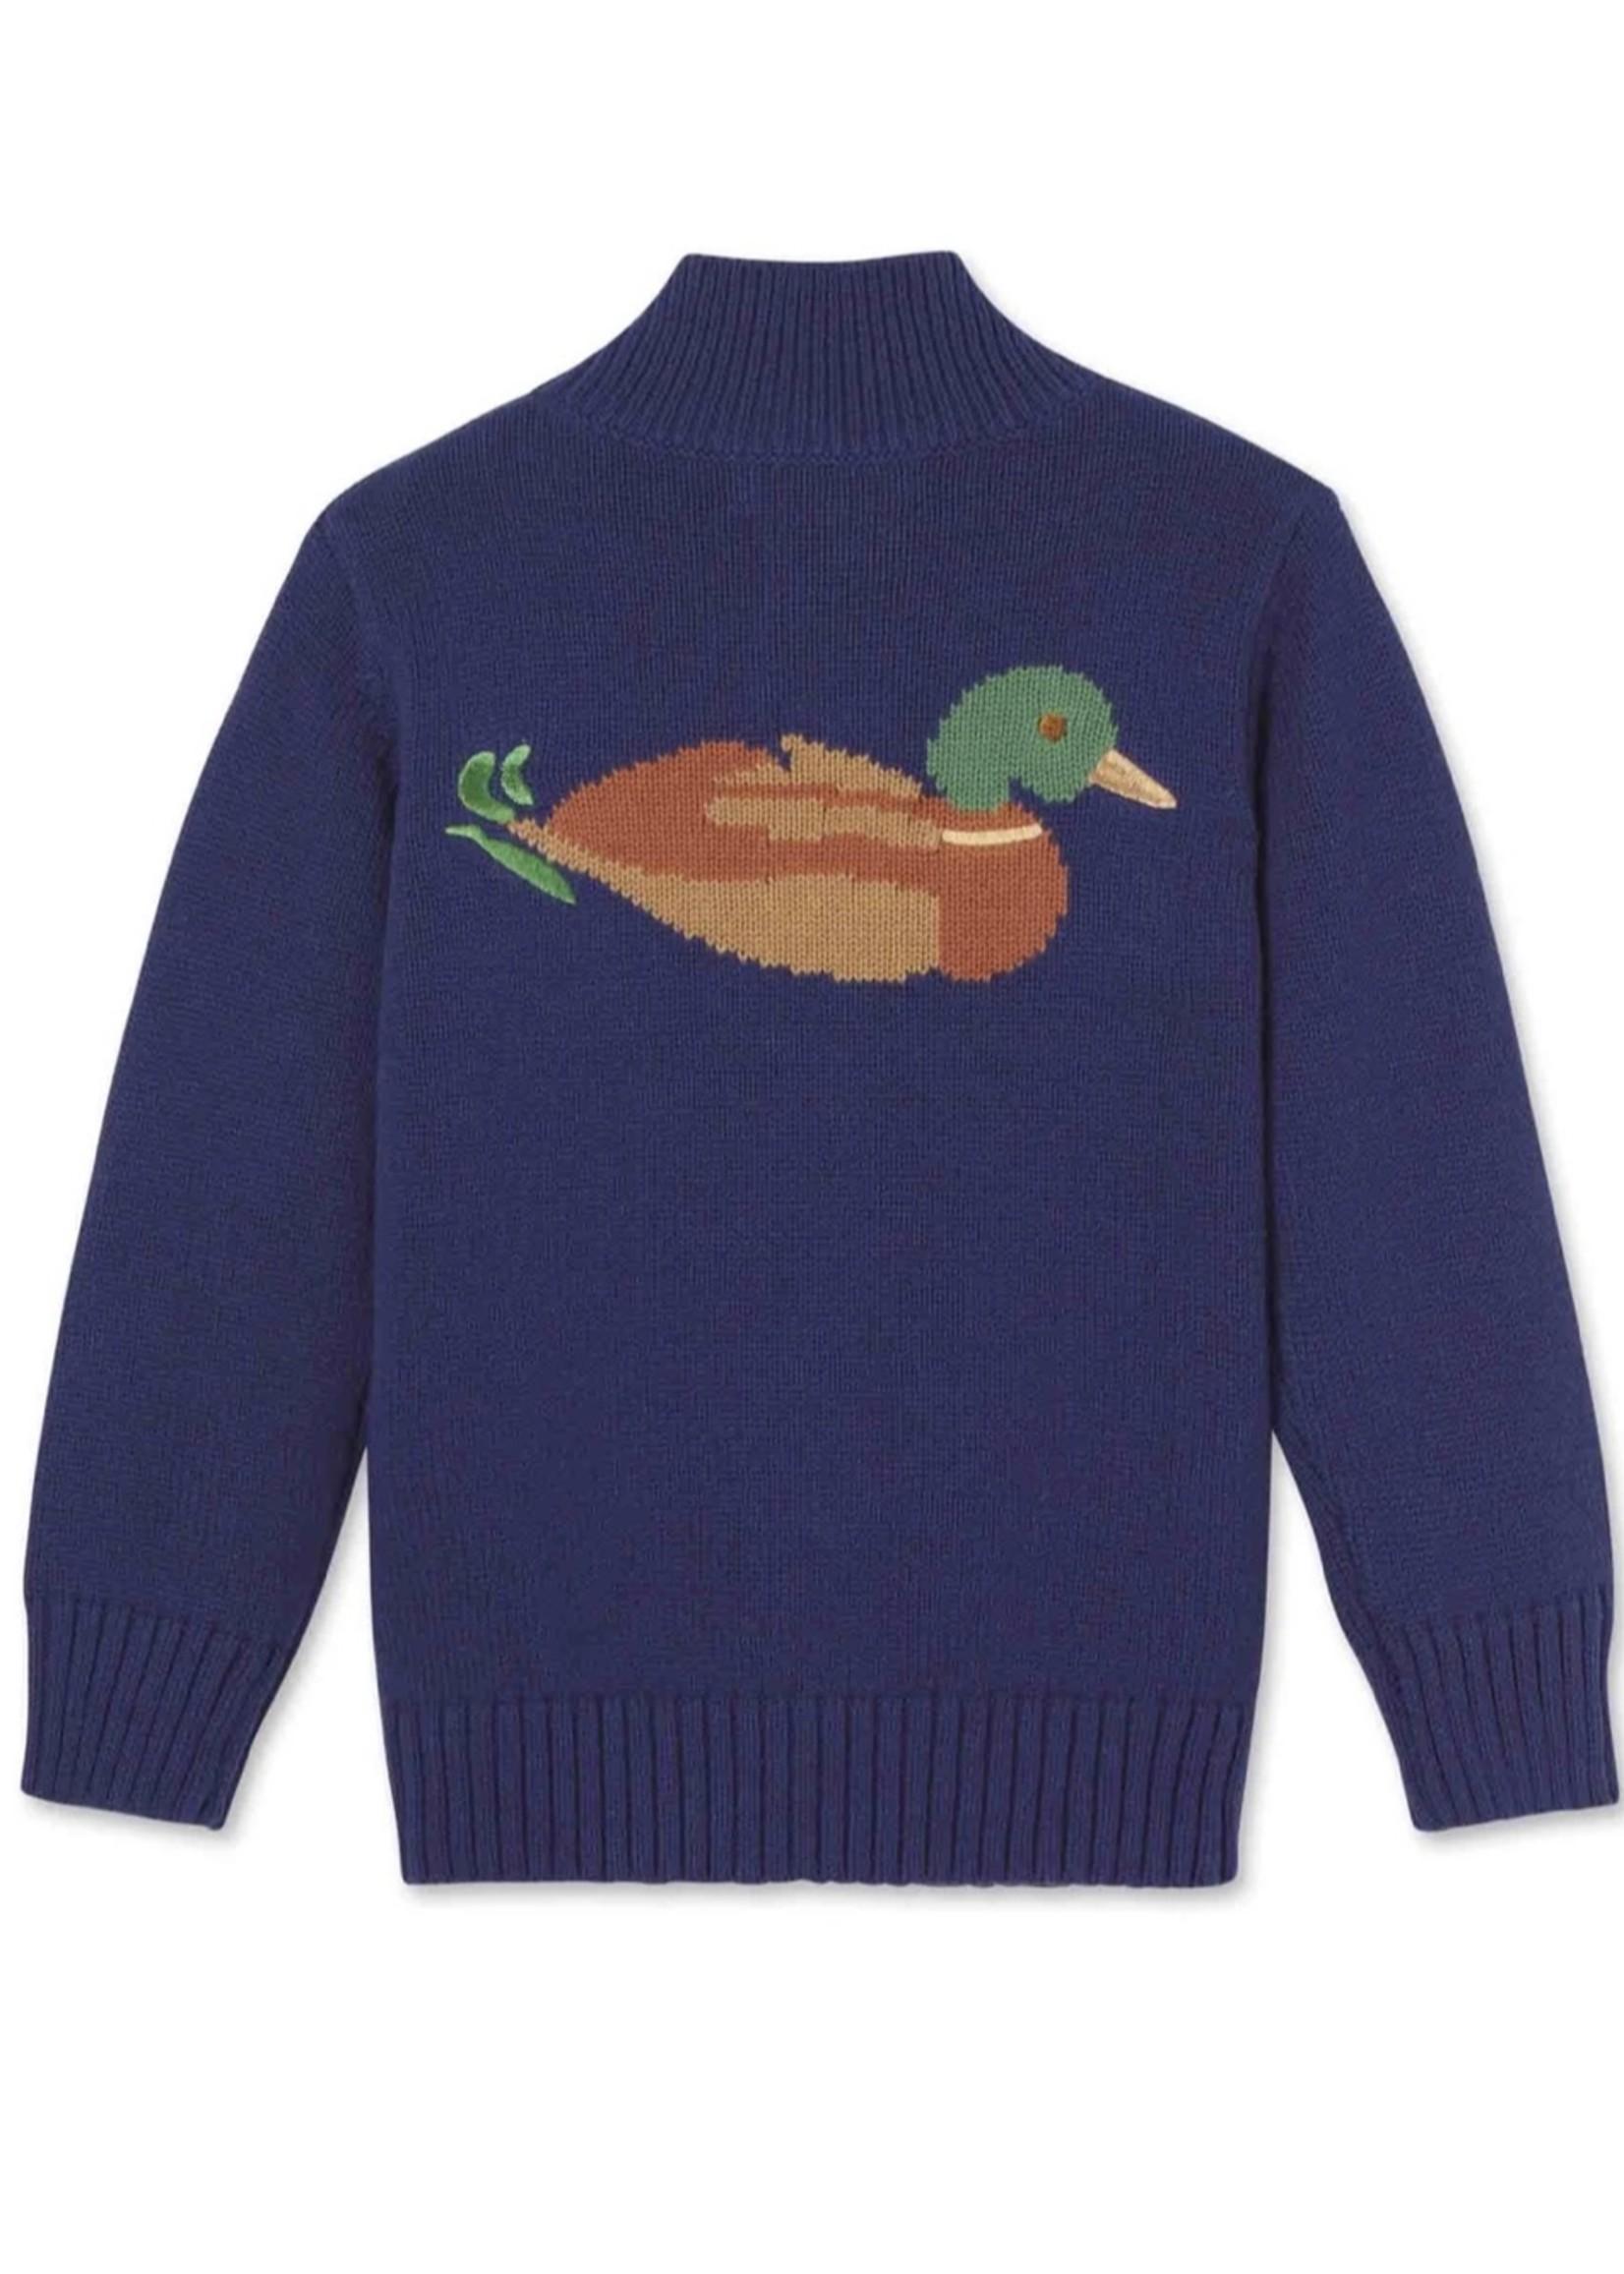 Scott Duck Sweater - Blue Ribbon